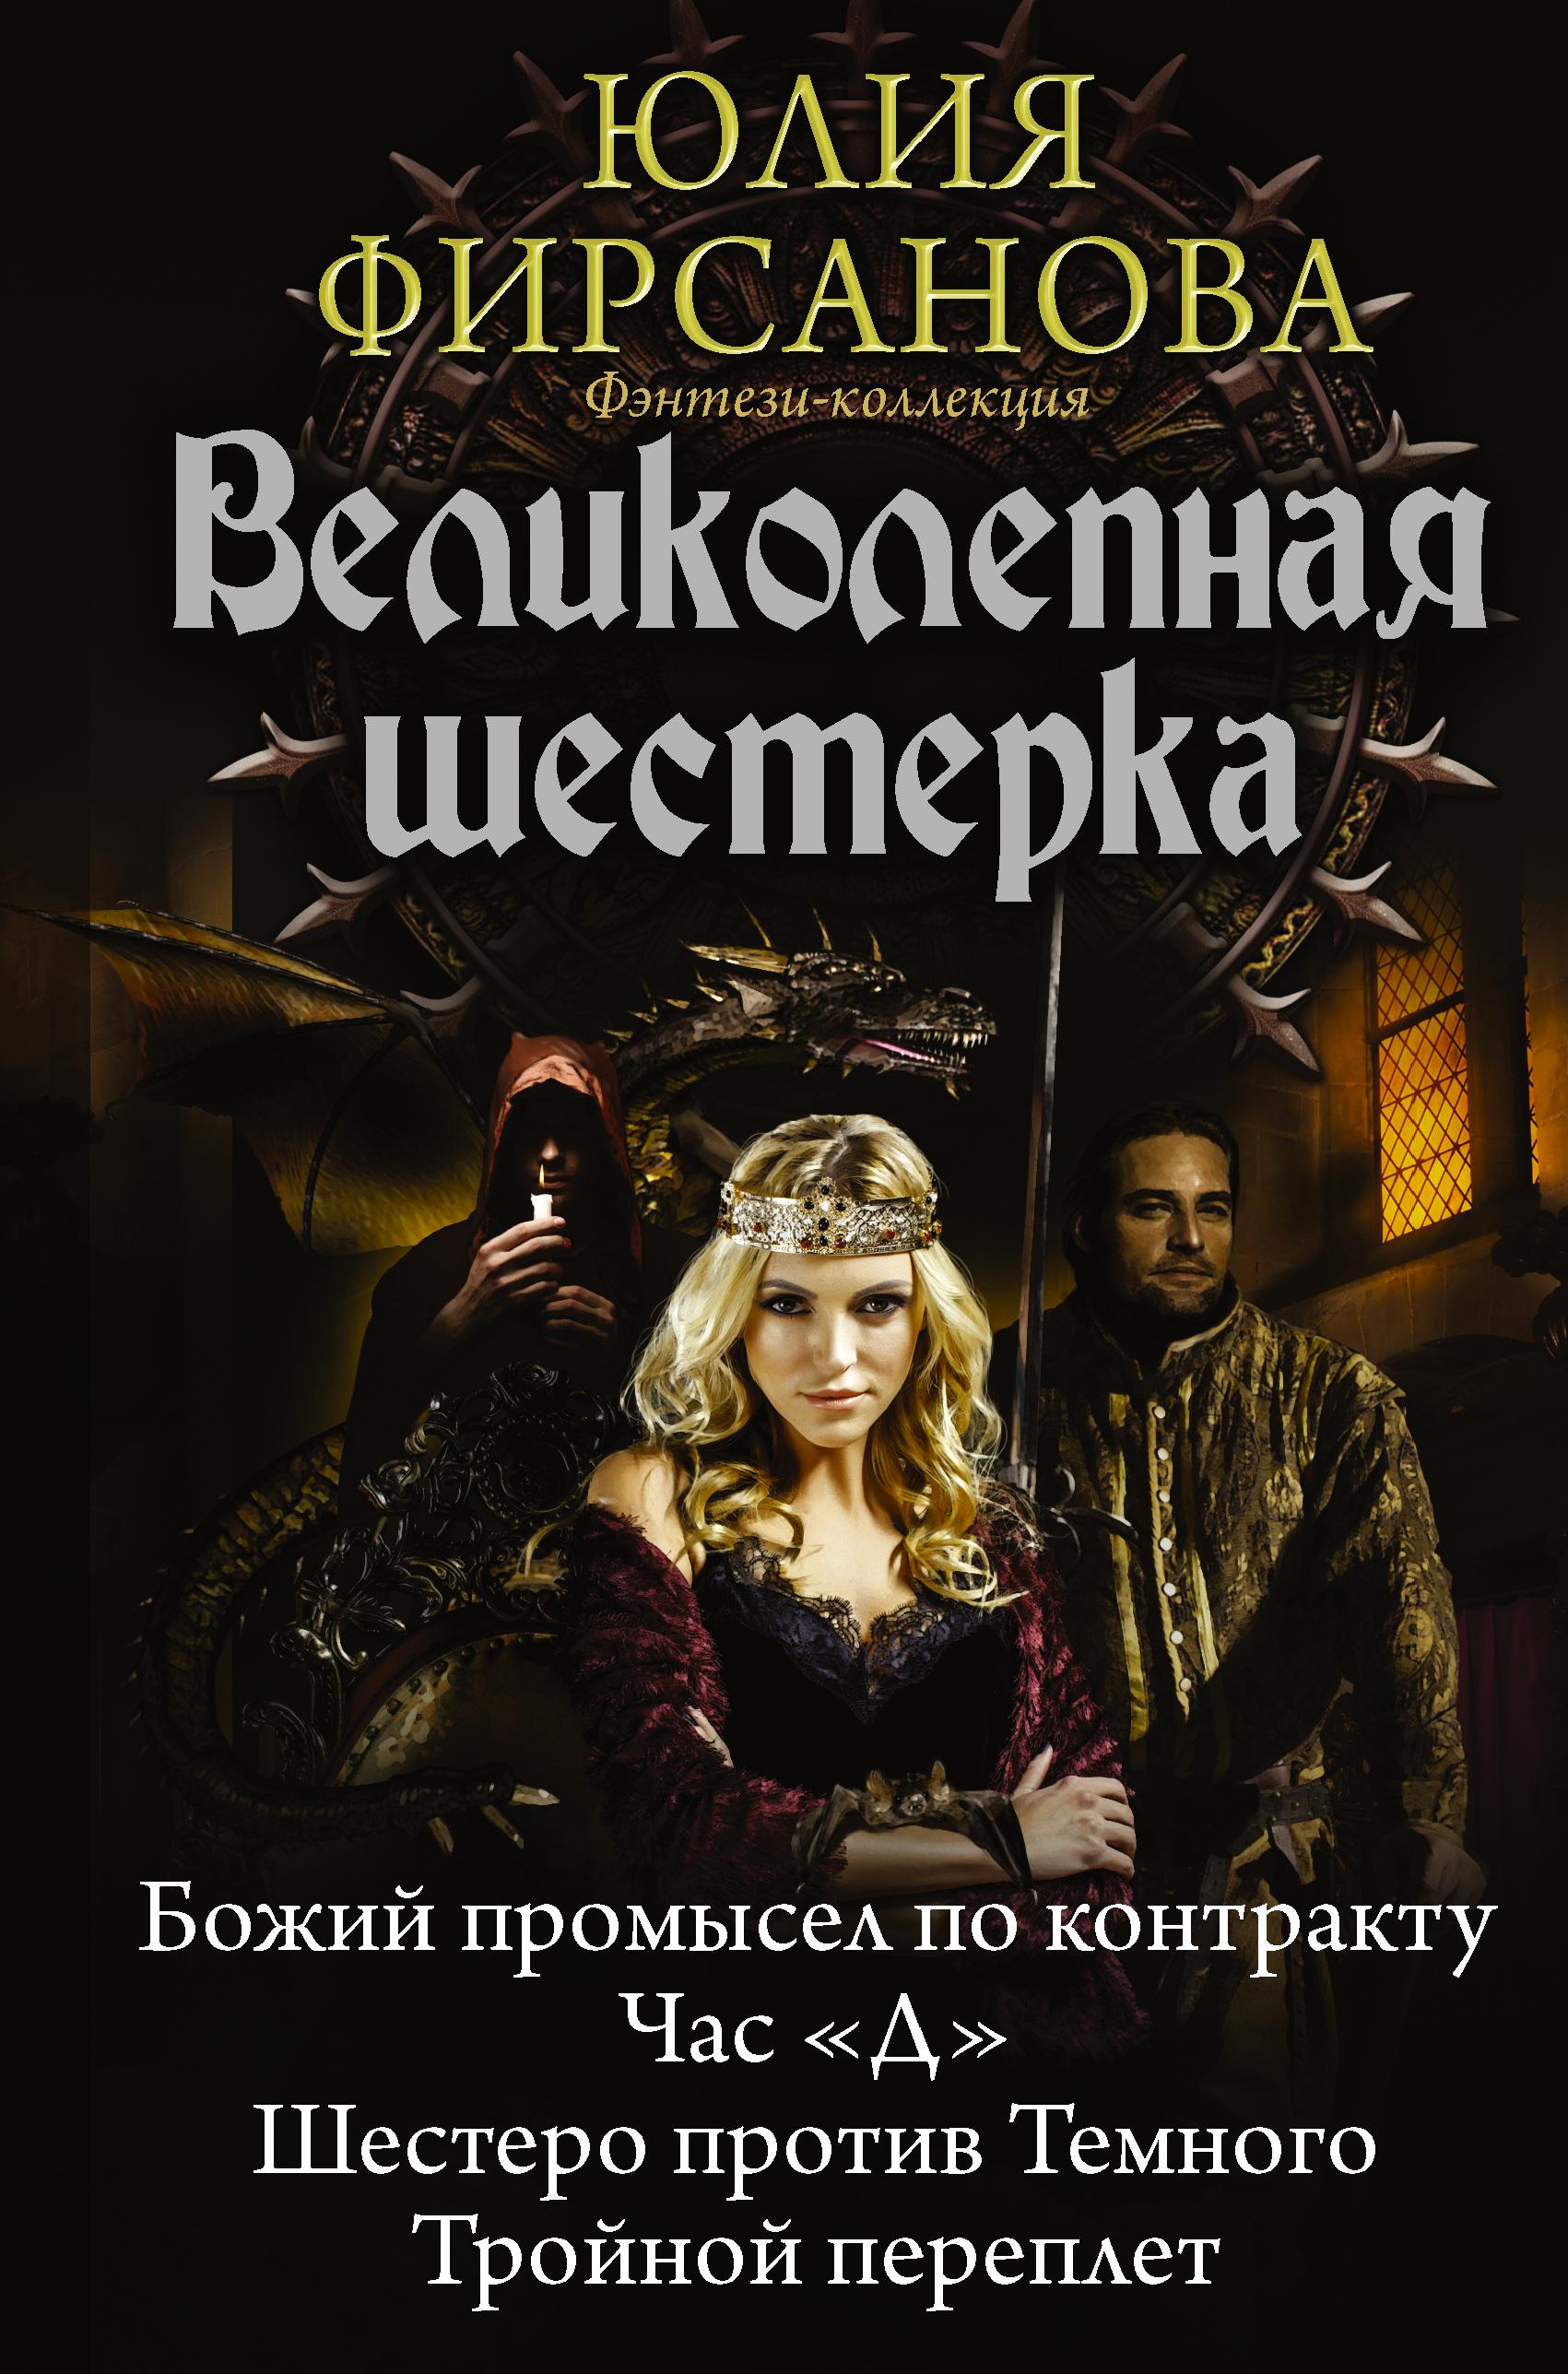 Фирсанова Юлия Великолепная шестерка юлия фирсанова возвращение